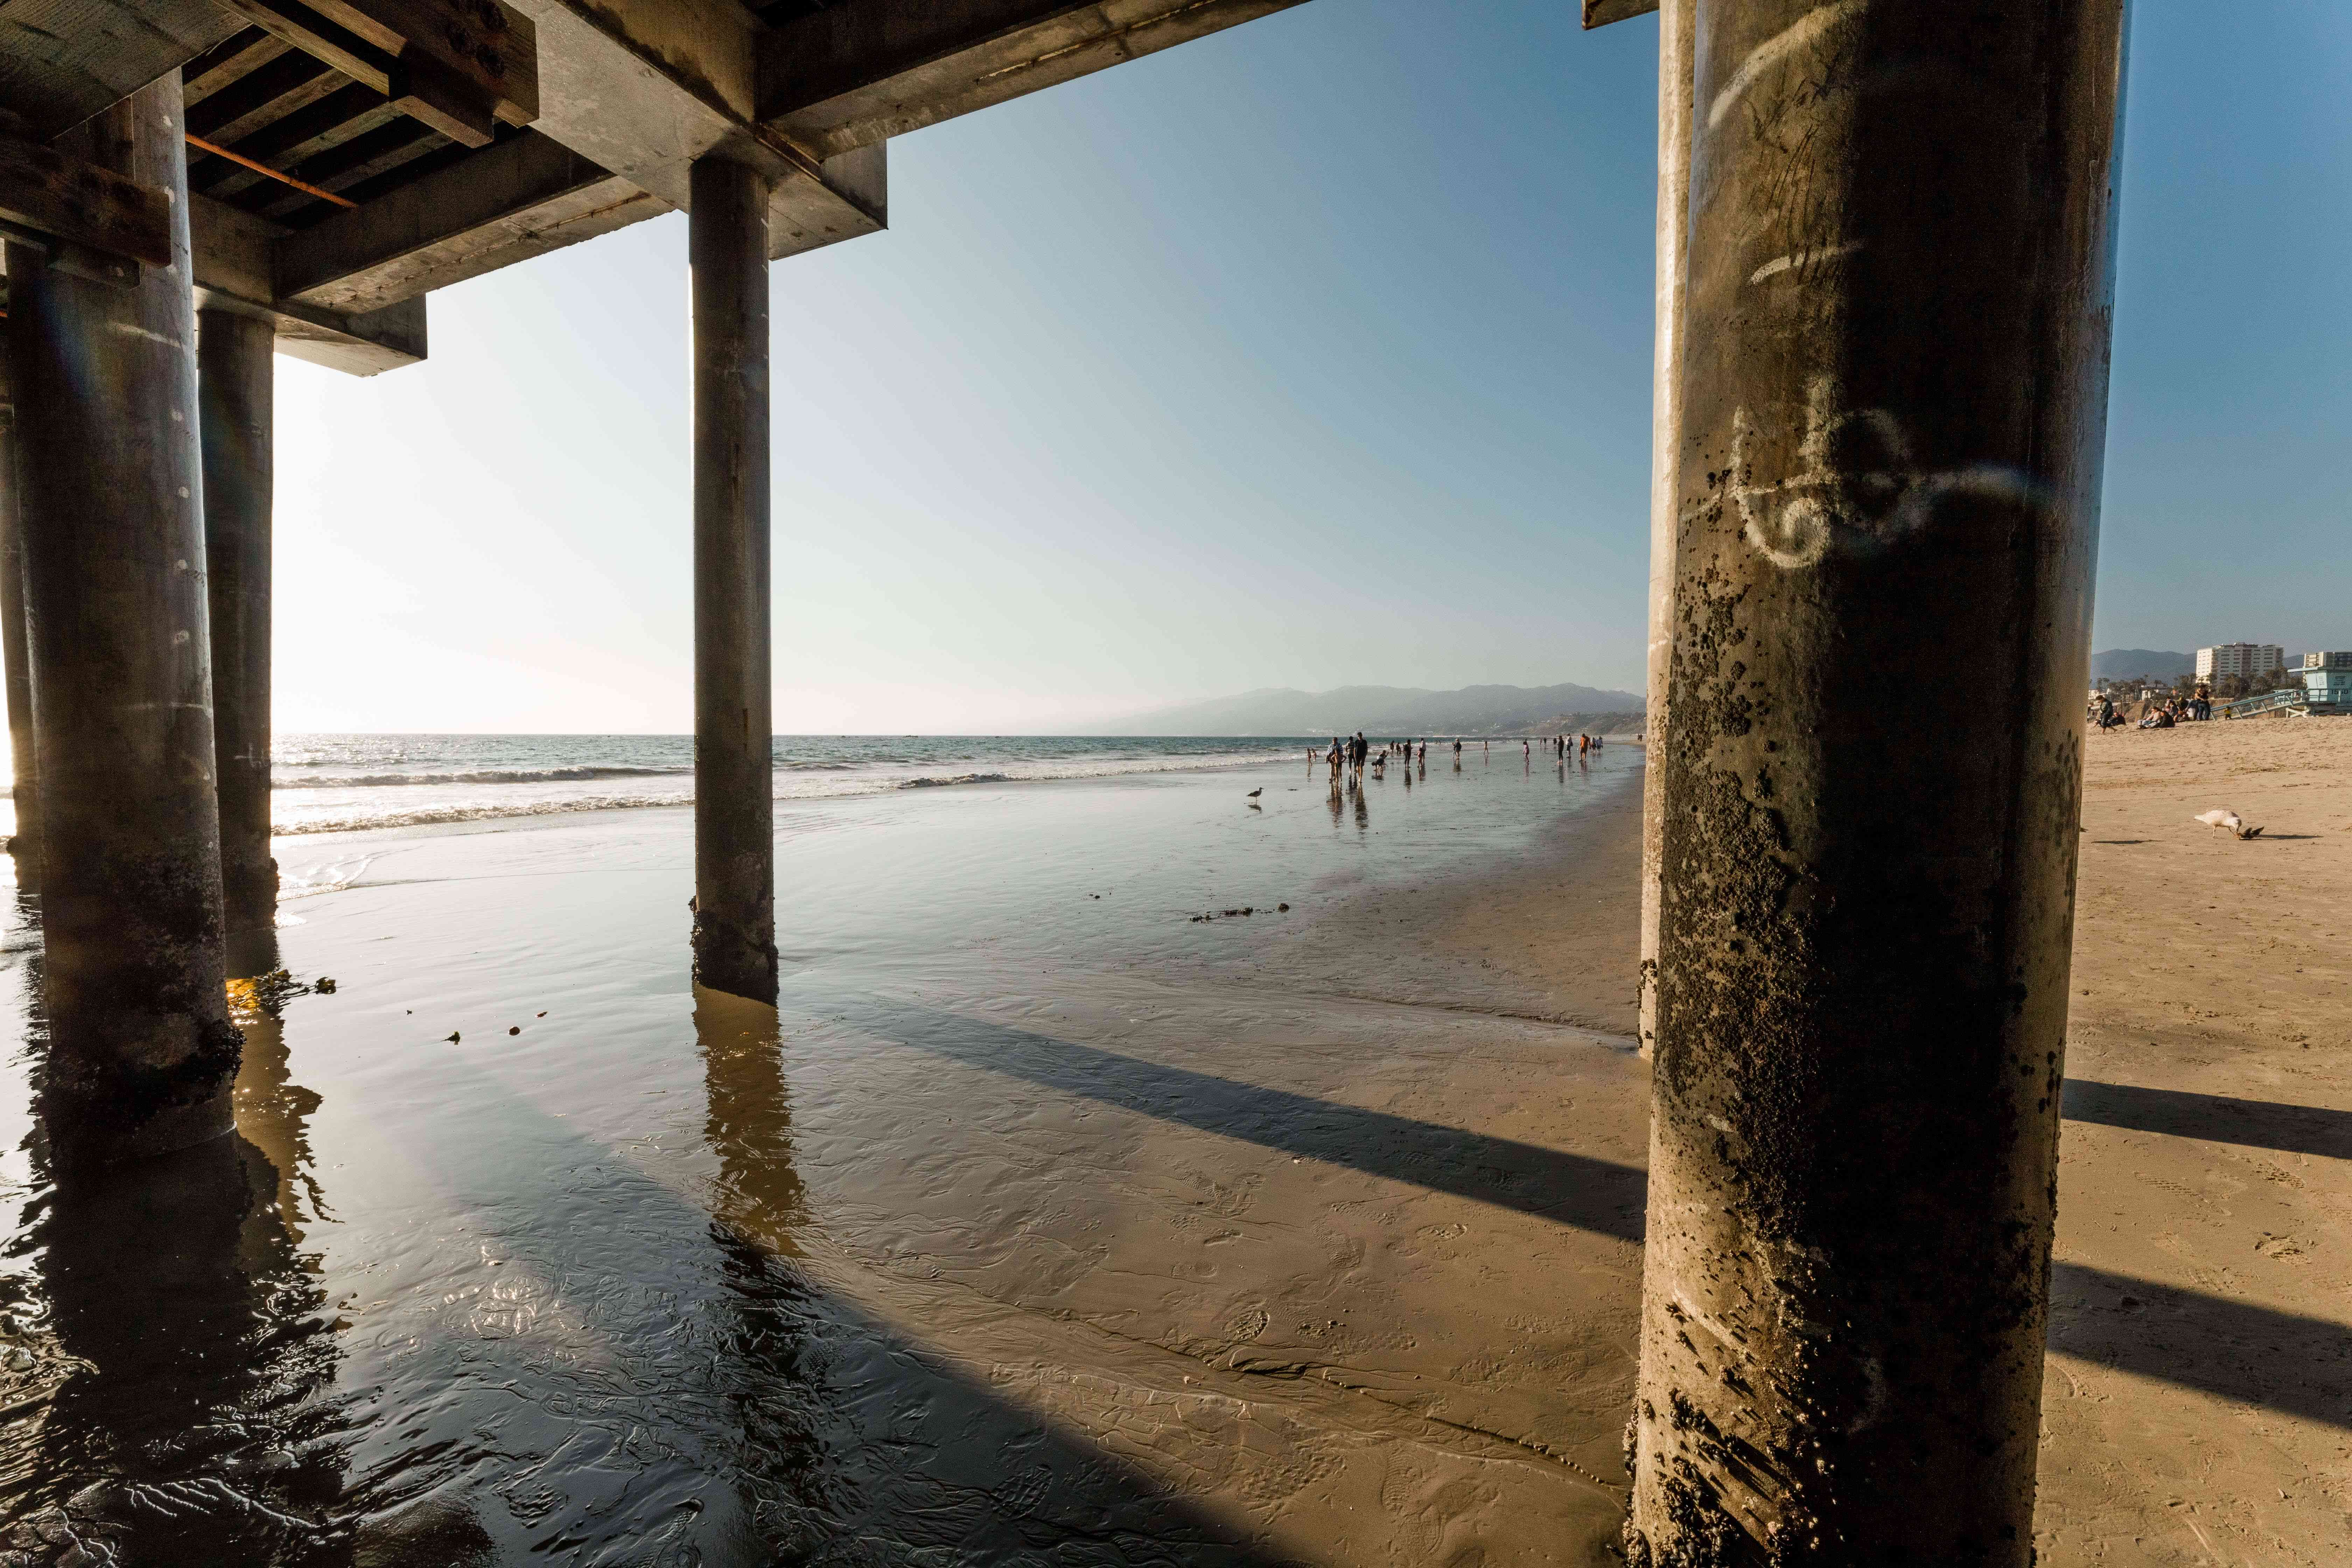 Santa Monica Beach in Los Angeles, CA